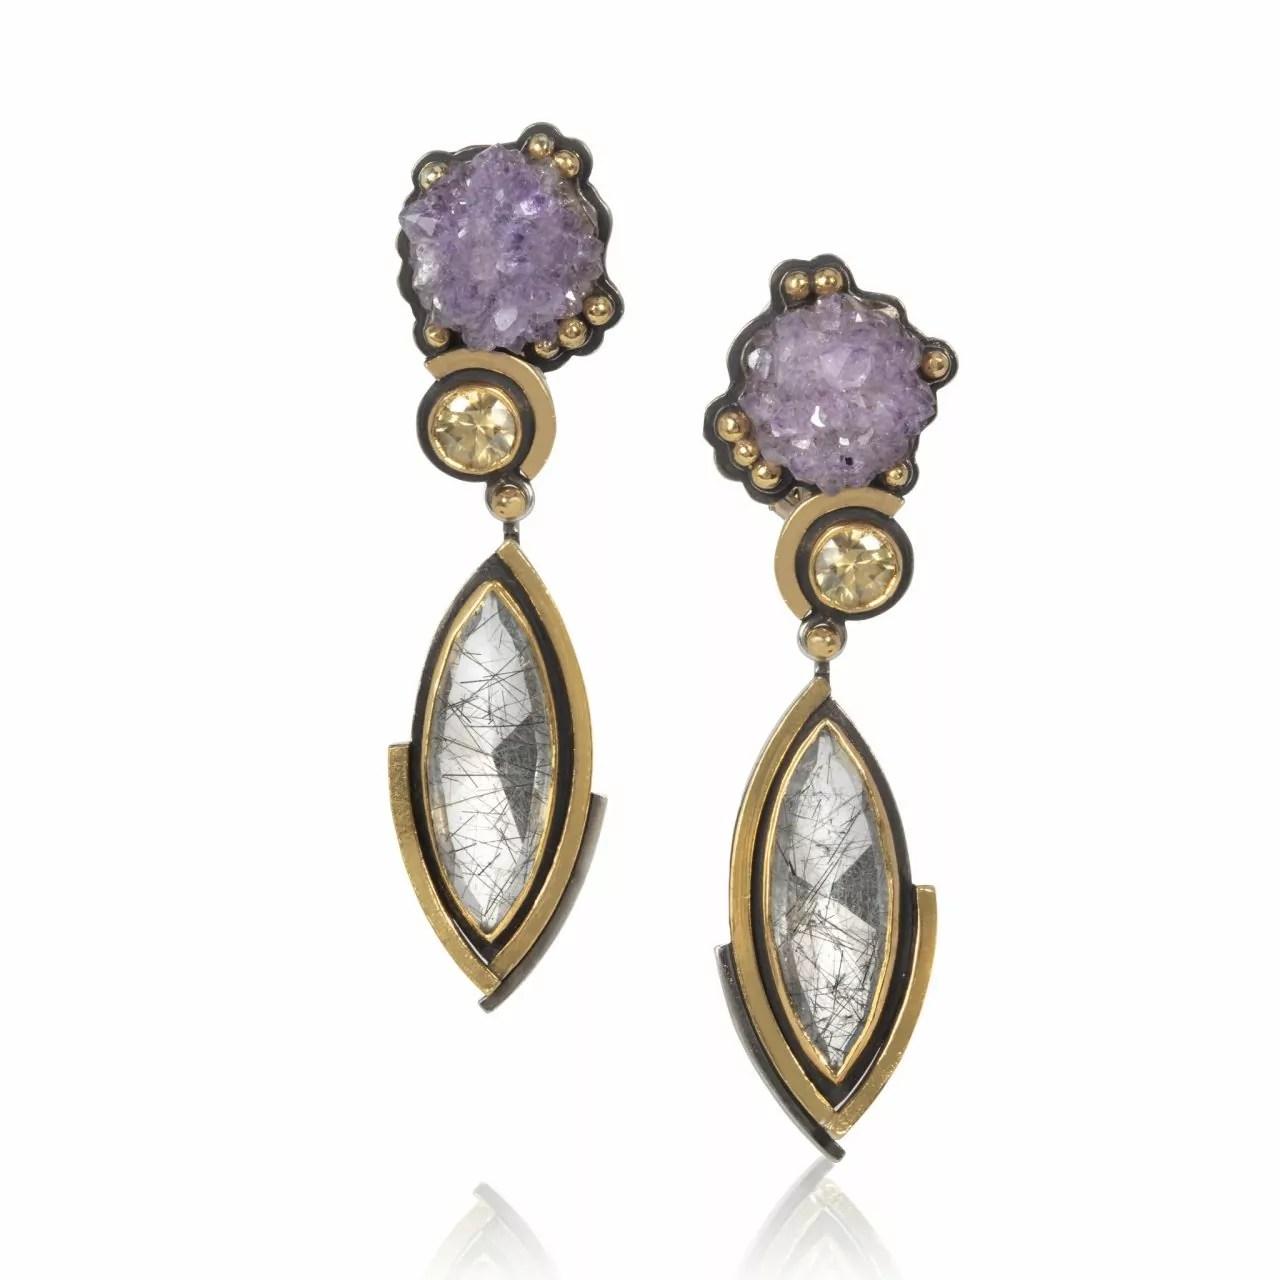 Amethyst, Quartz and Grossular Garnet Earrings